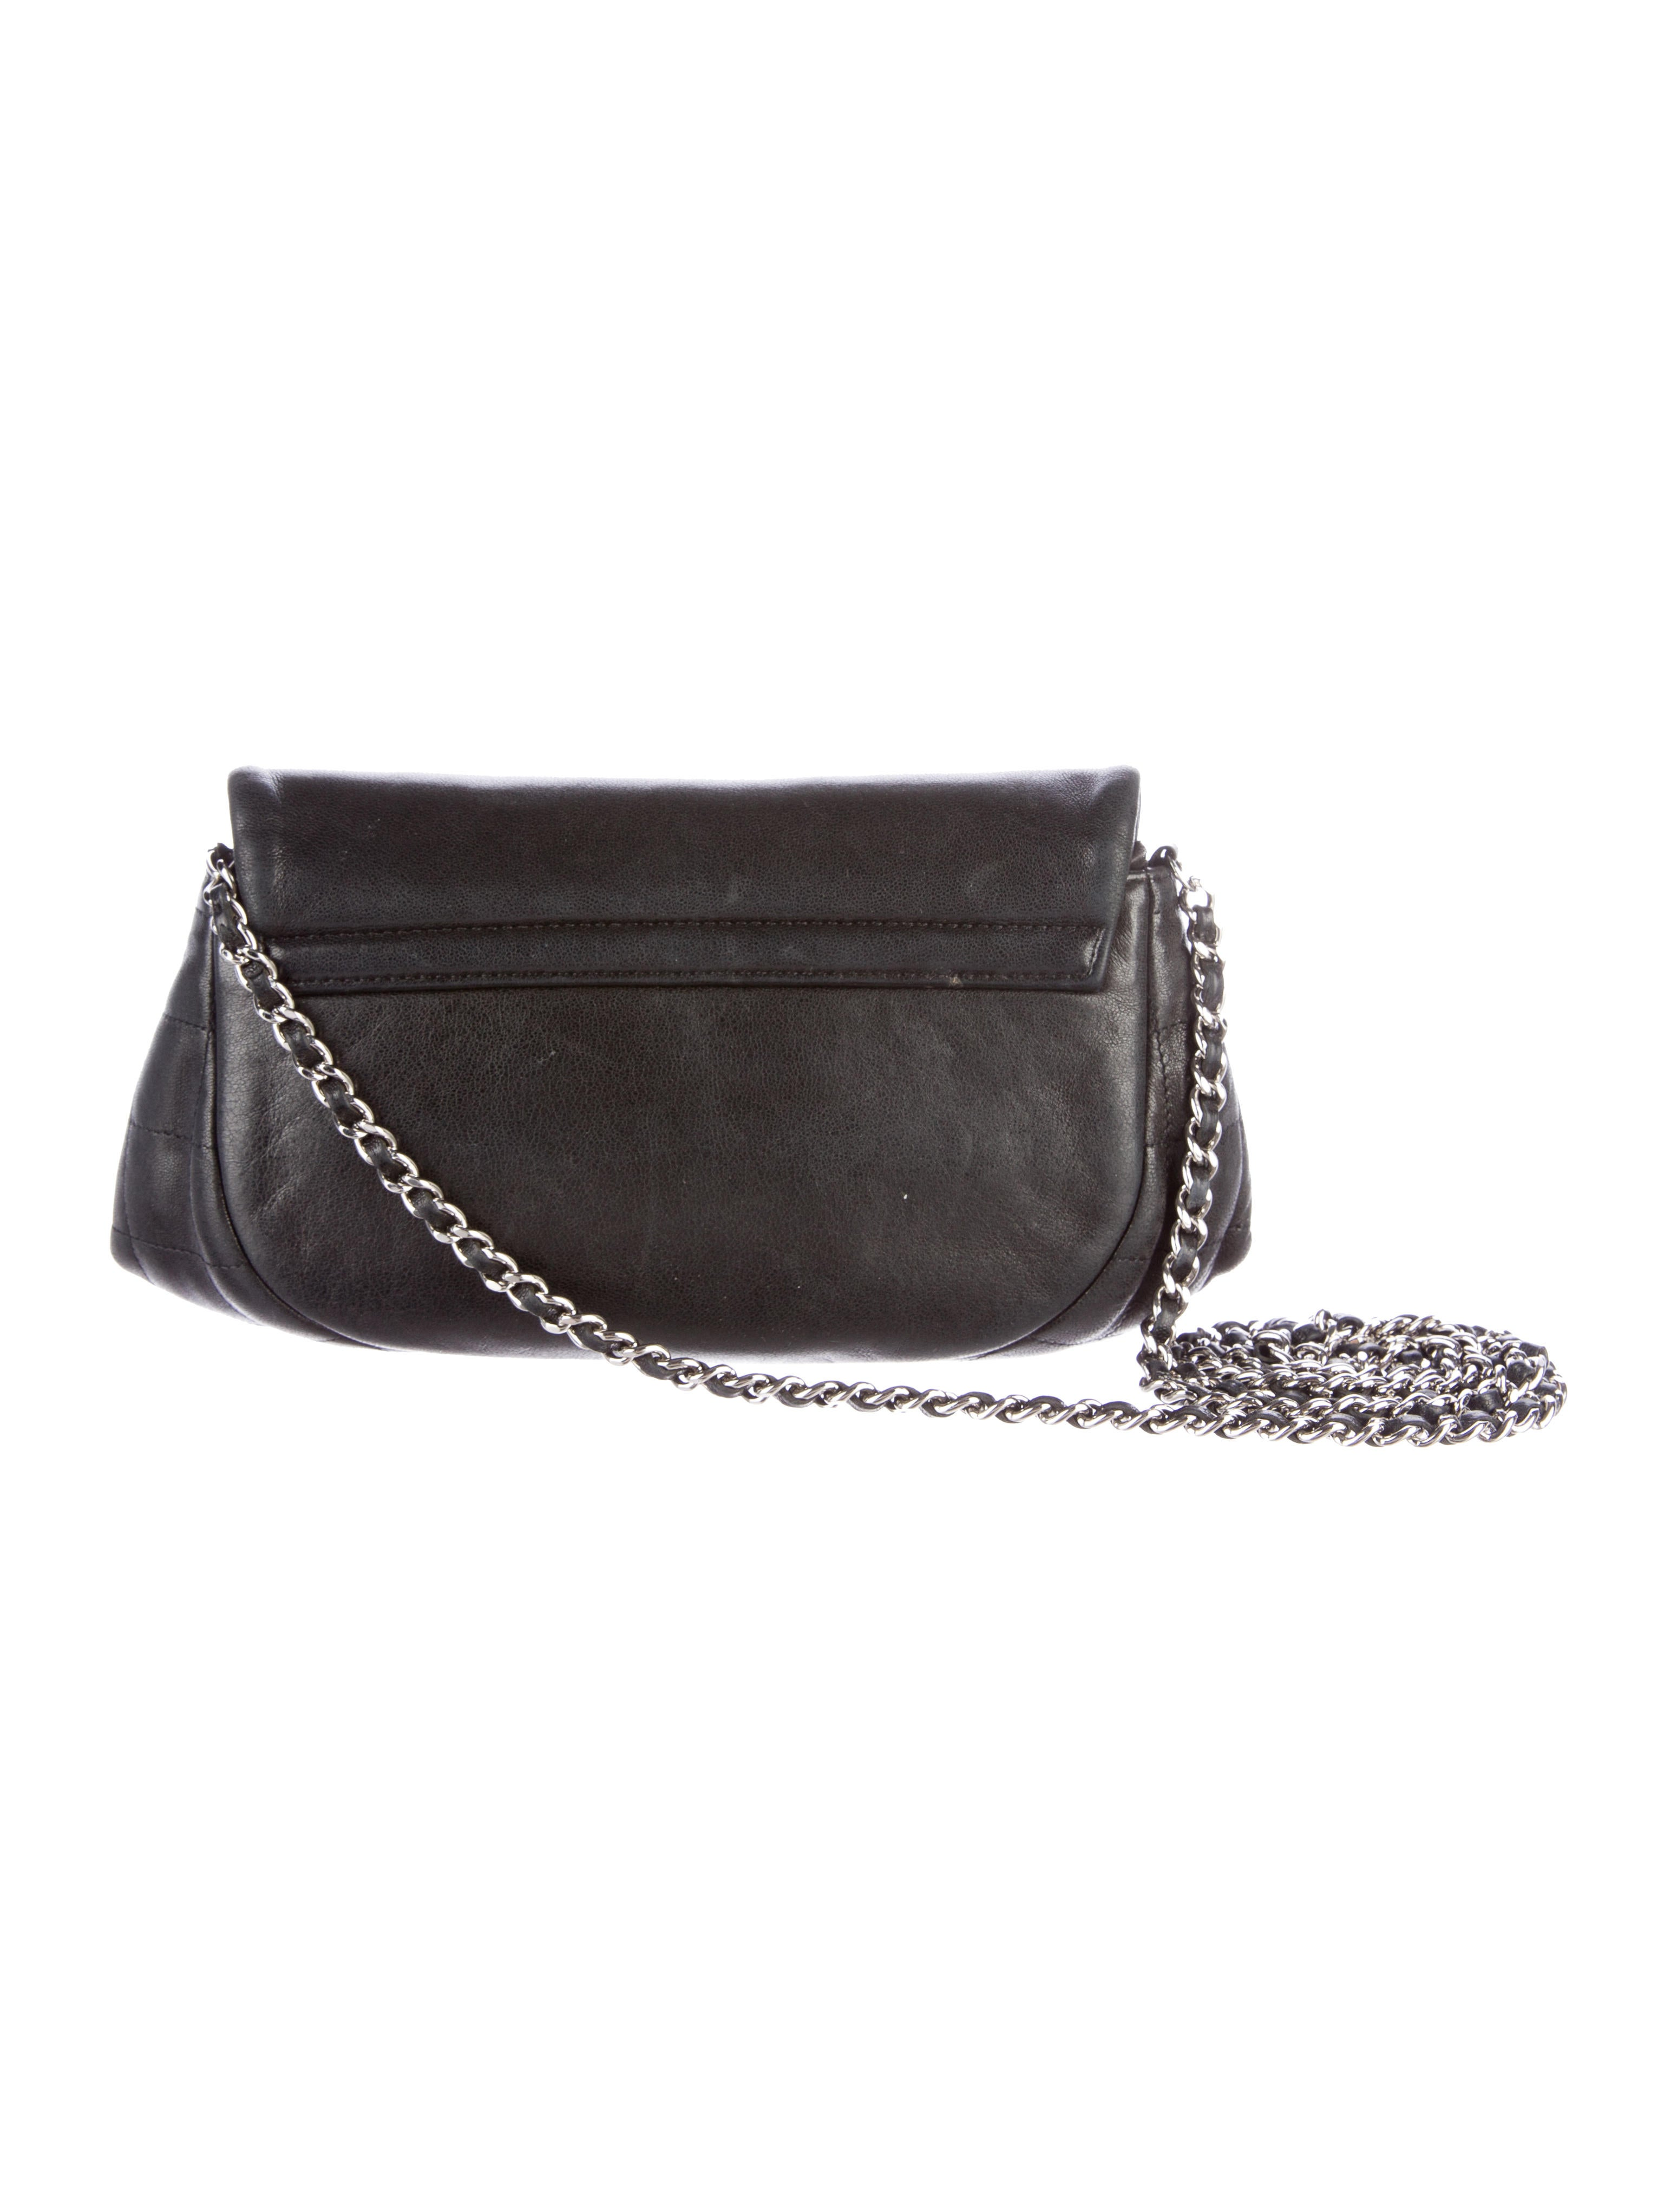 fb7a505b9cb9 Chanel Half Moon Wallet On Chain - Handbags - CHA184438 .